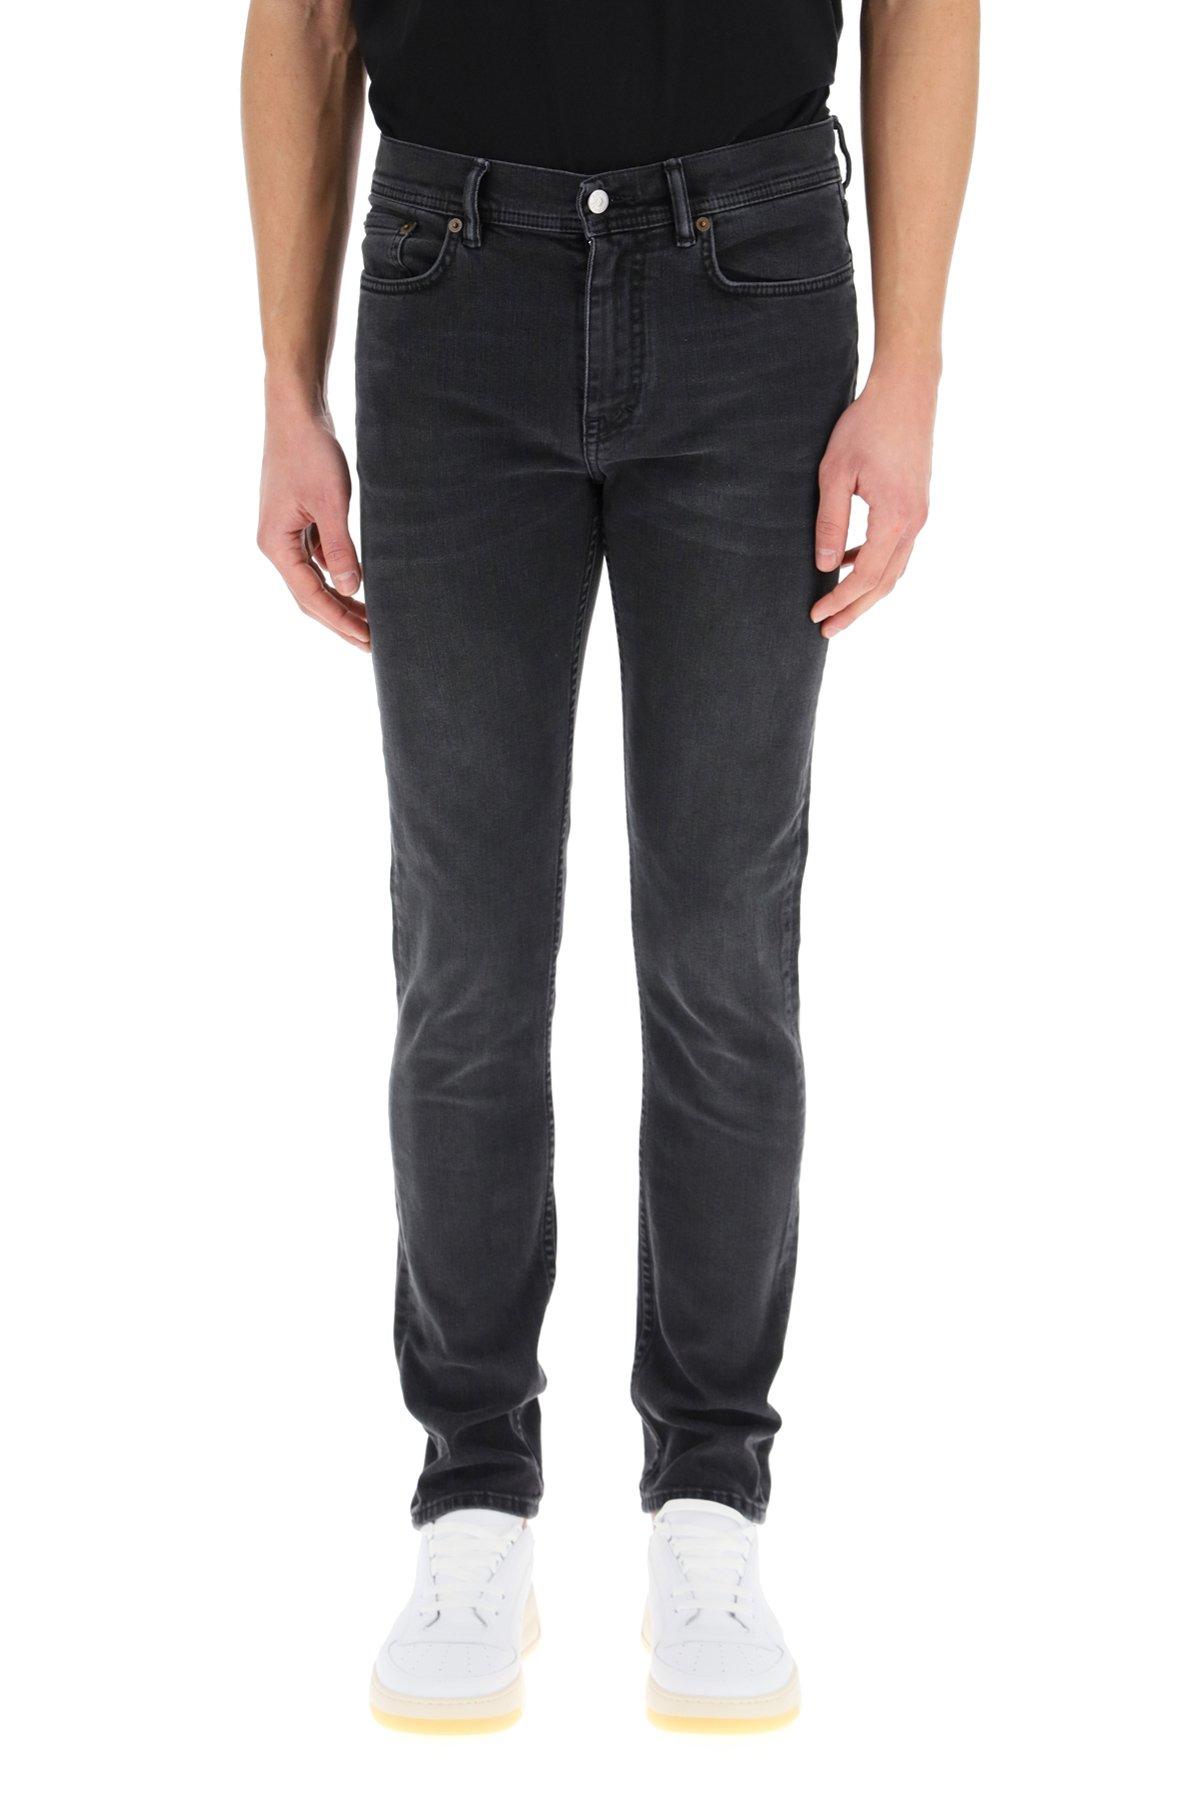 Acne studios jeans north nero sbiadito